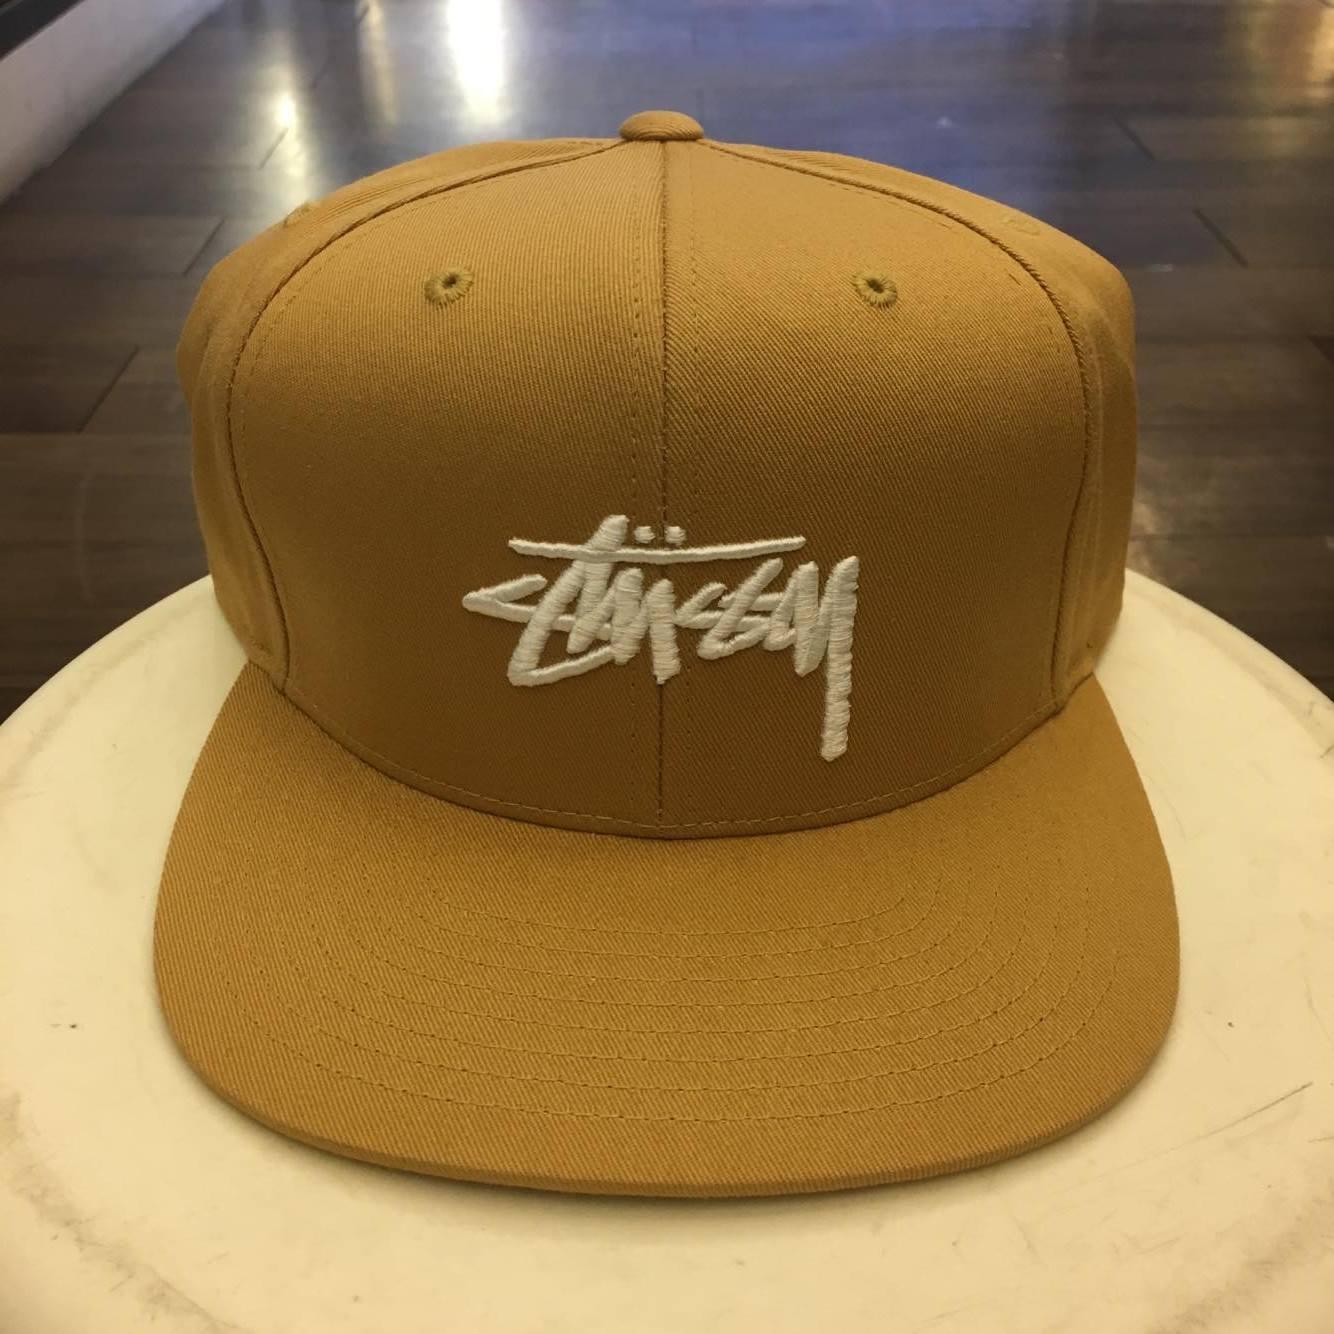 BEETLE STUSSY SP17 CAP 卡其 土黃 經典 LOGO 後扣帽 大小可調 SNAPBACK ST-55